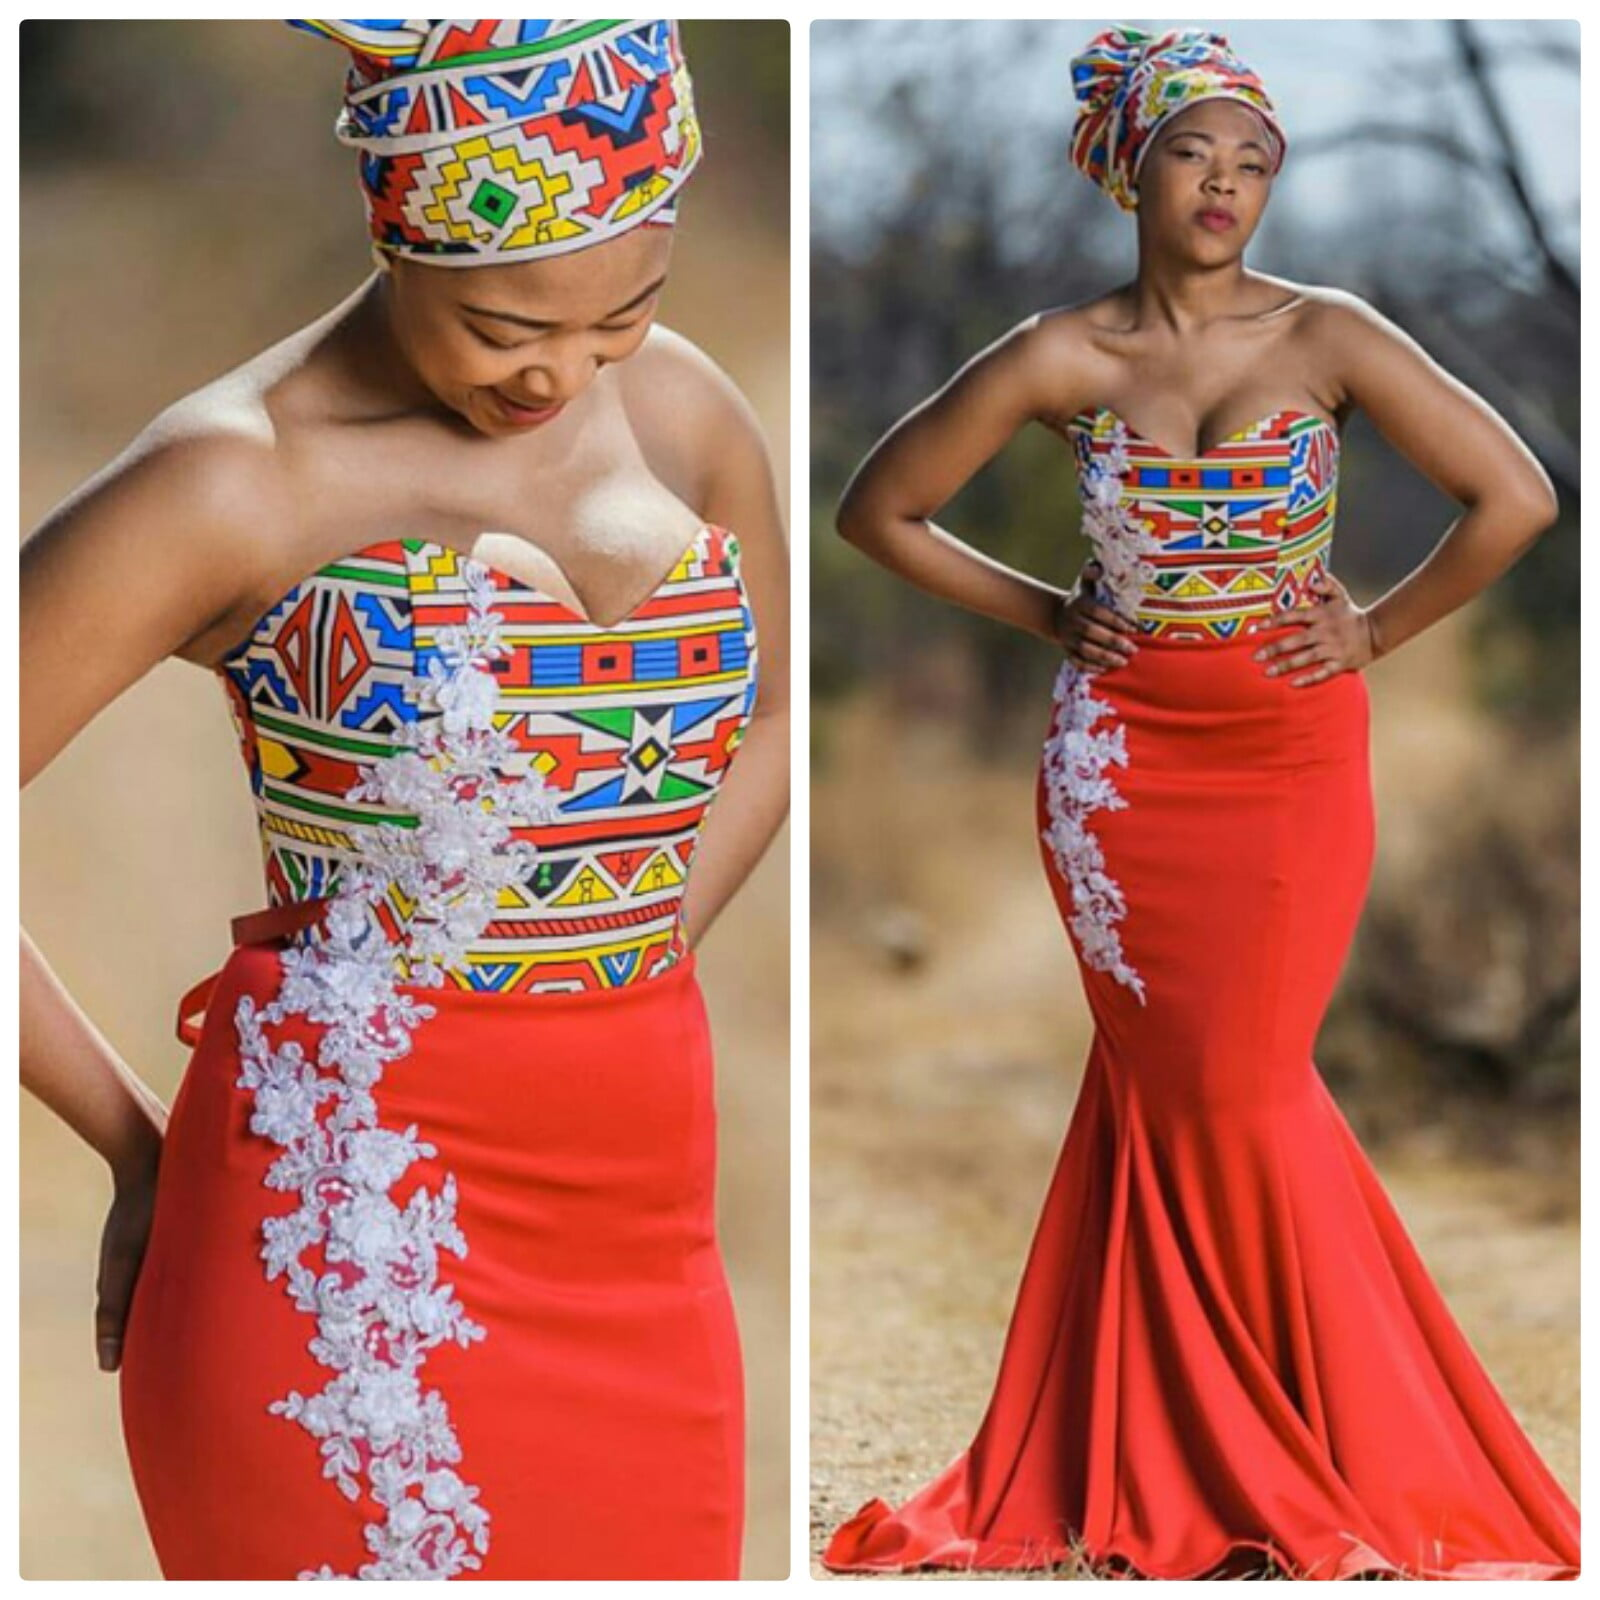 Lovely Ndebele Inspired Mermaid Dress With Headwrap 'Doek